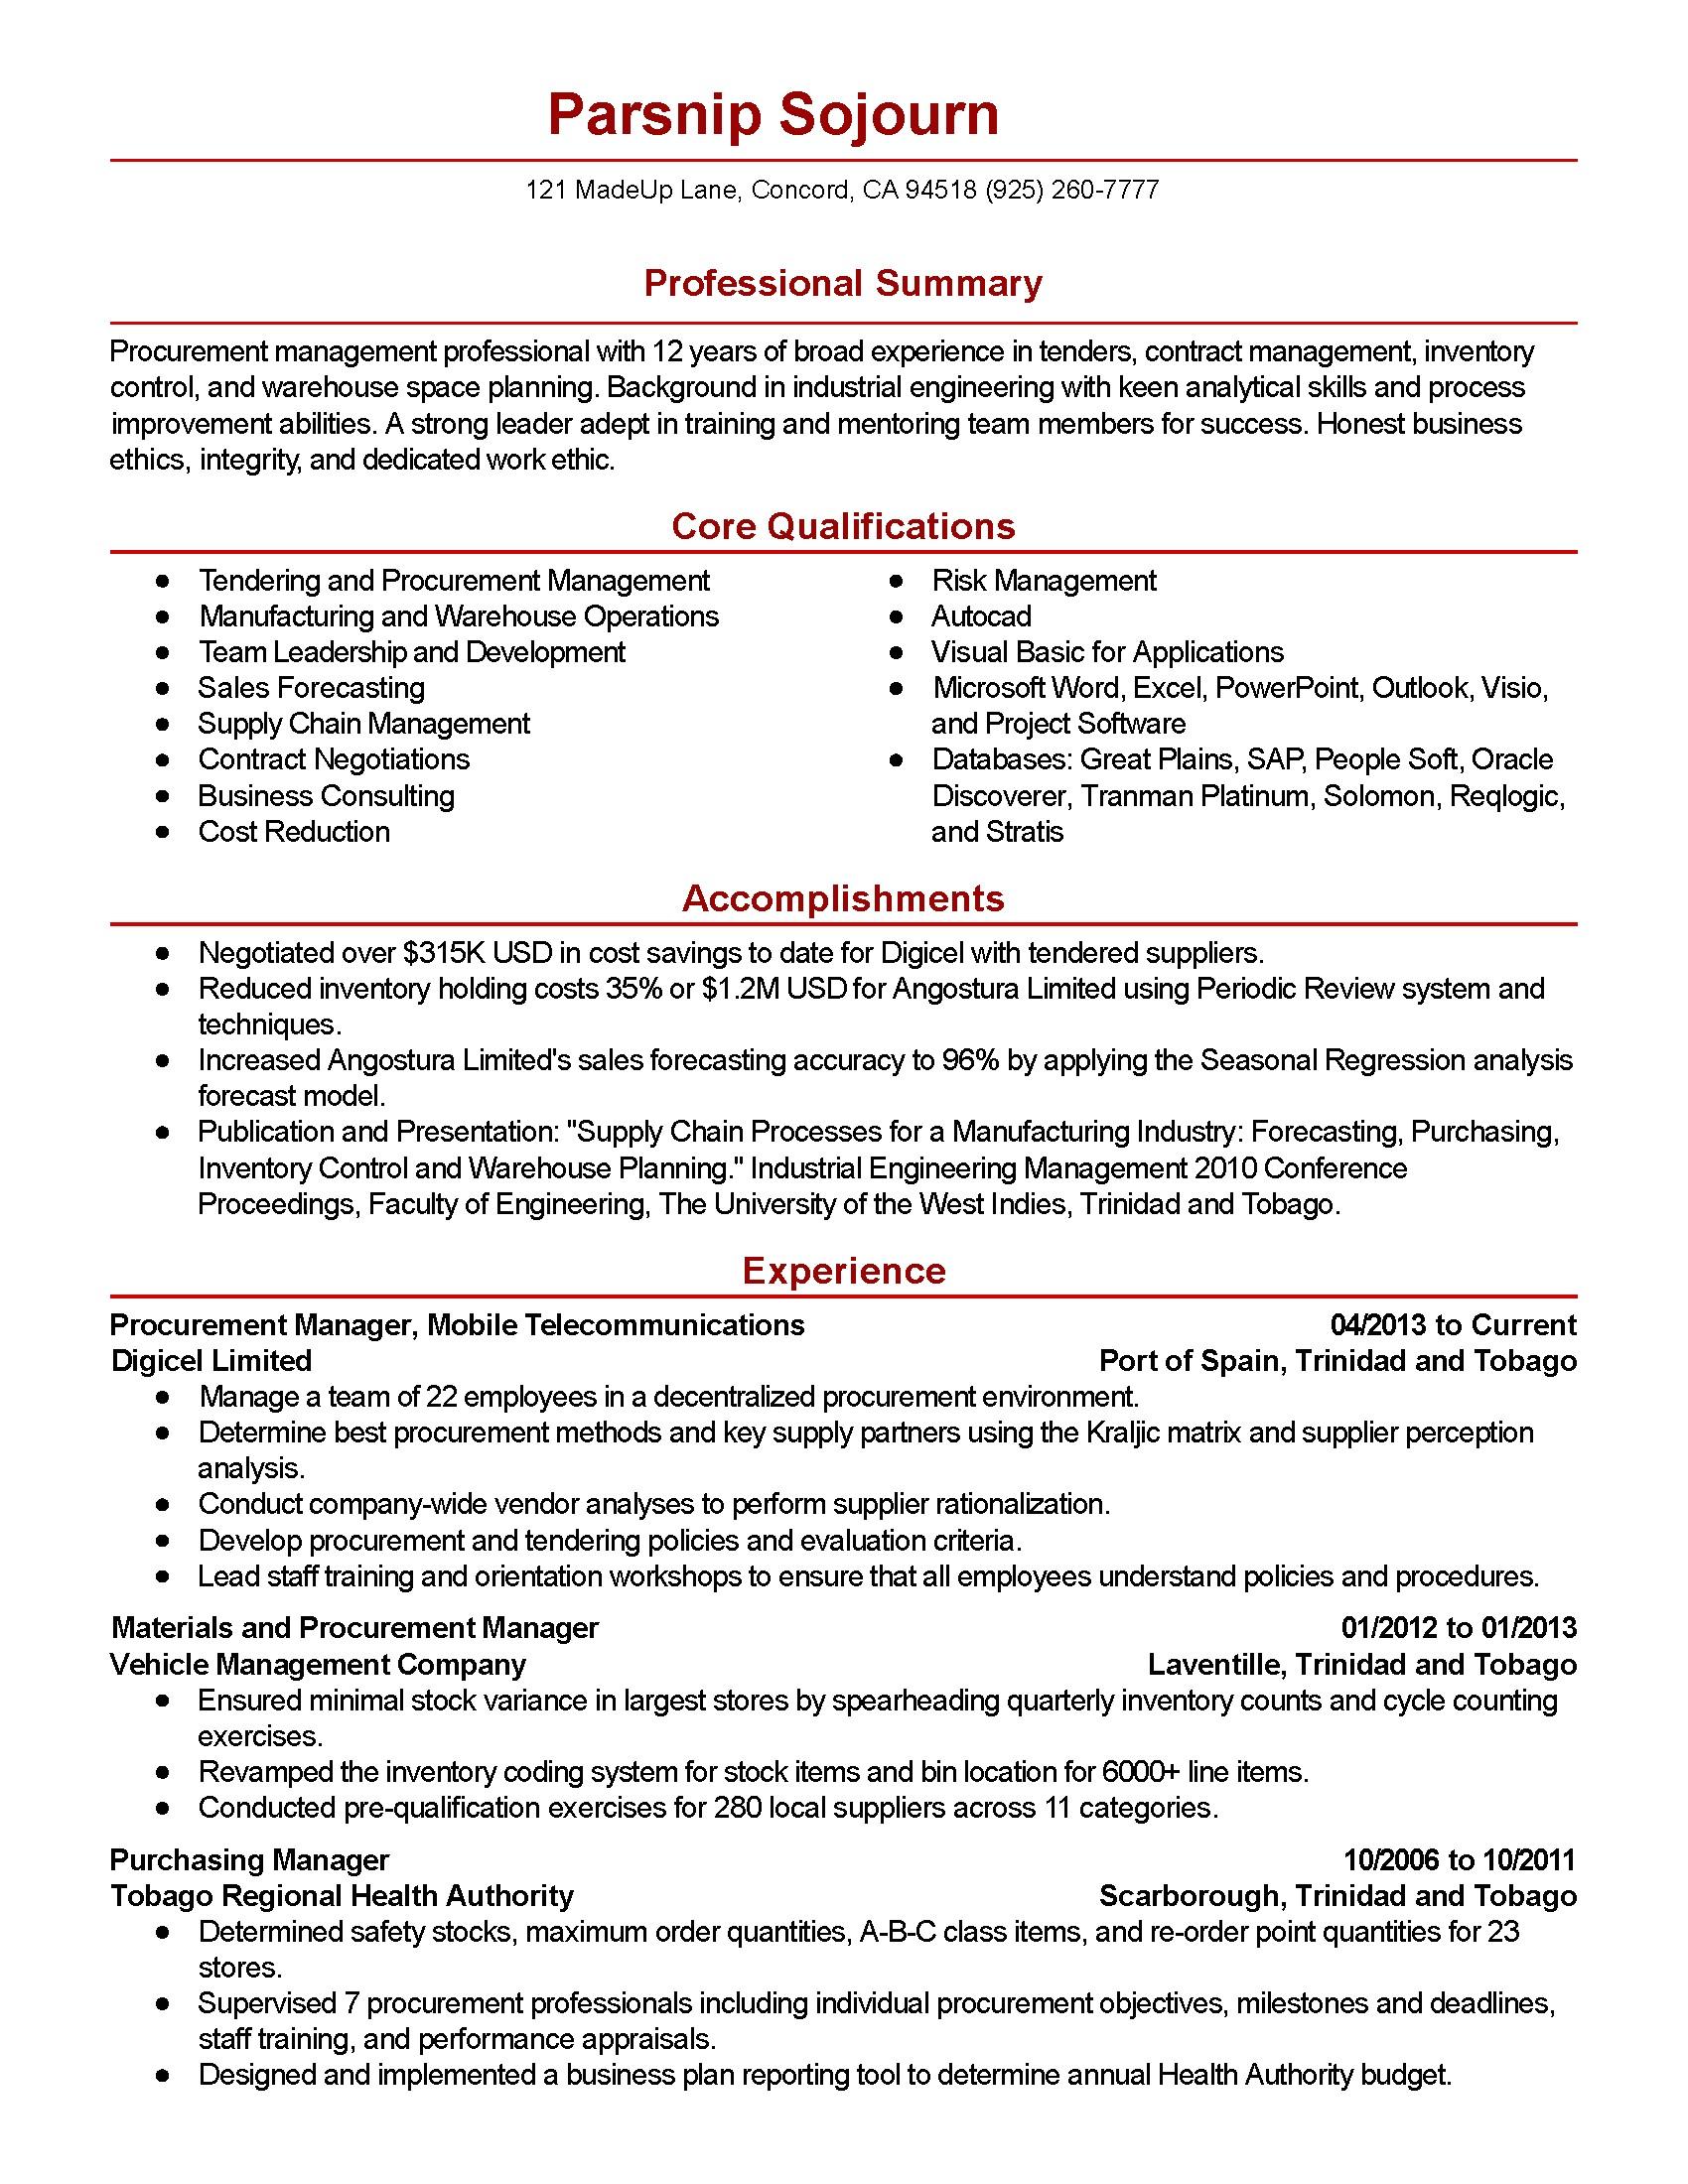 Procurement Coordinator Resume Sample Professional Procurement Manager Templates to Showcase